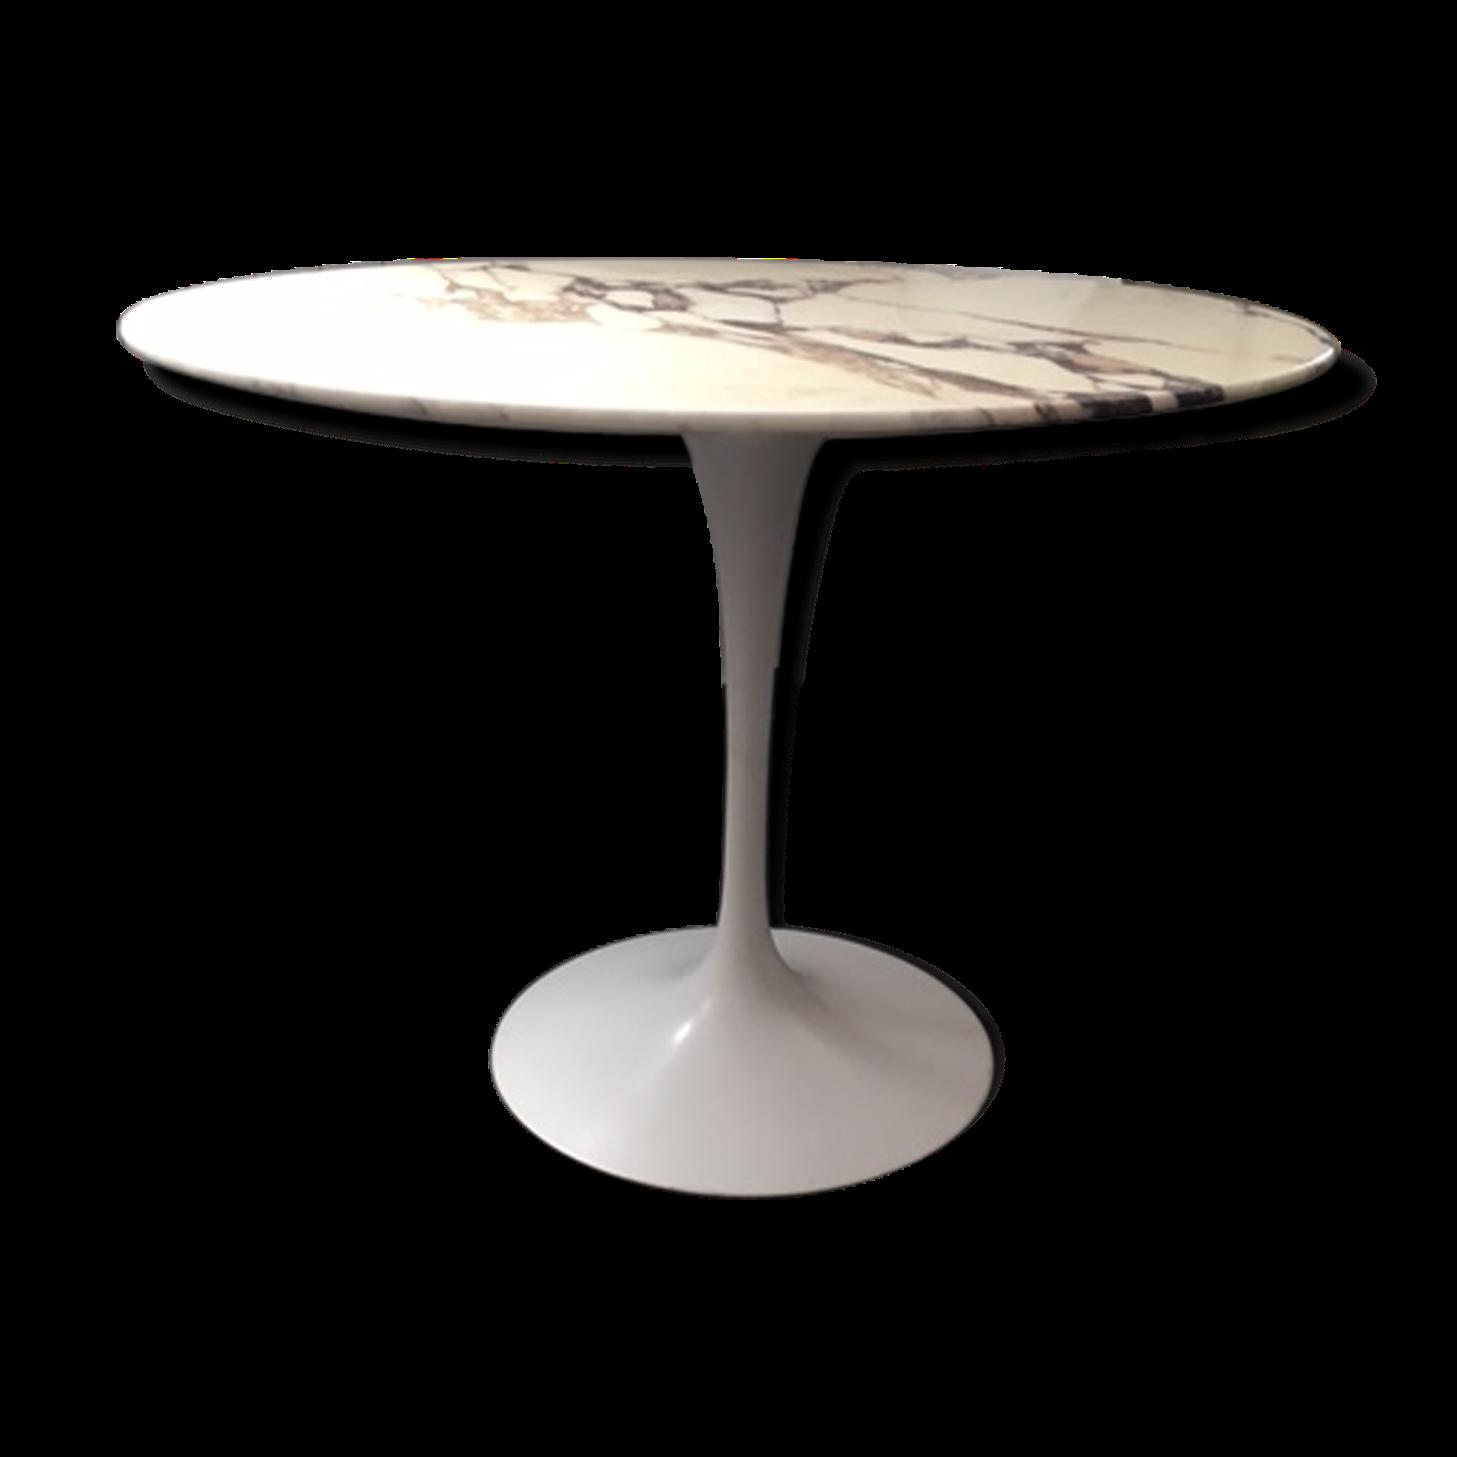 Table Saarinen Knoll International marbre carrare